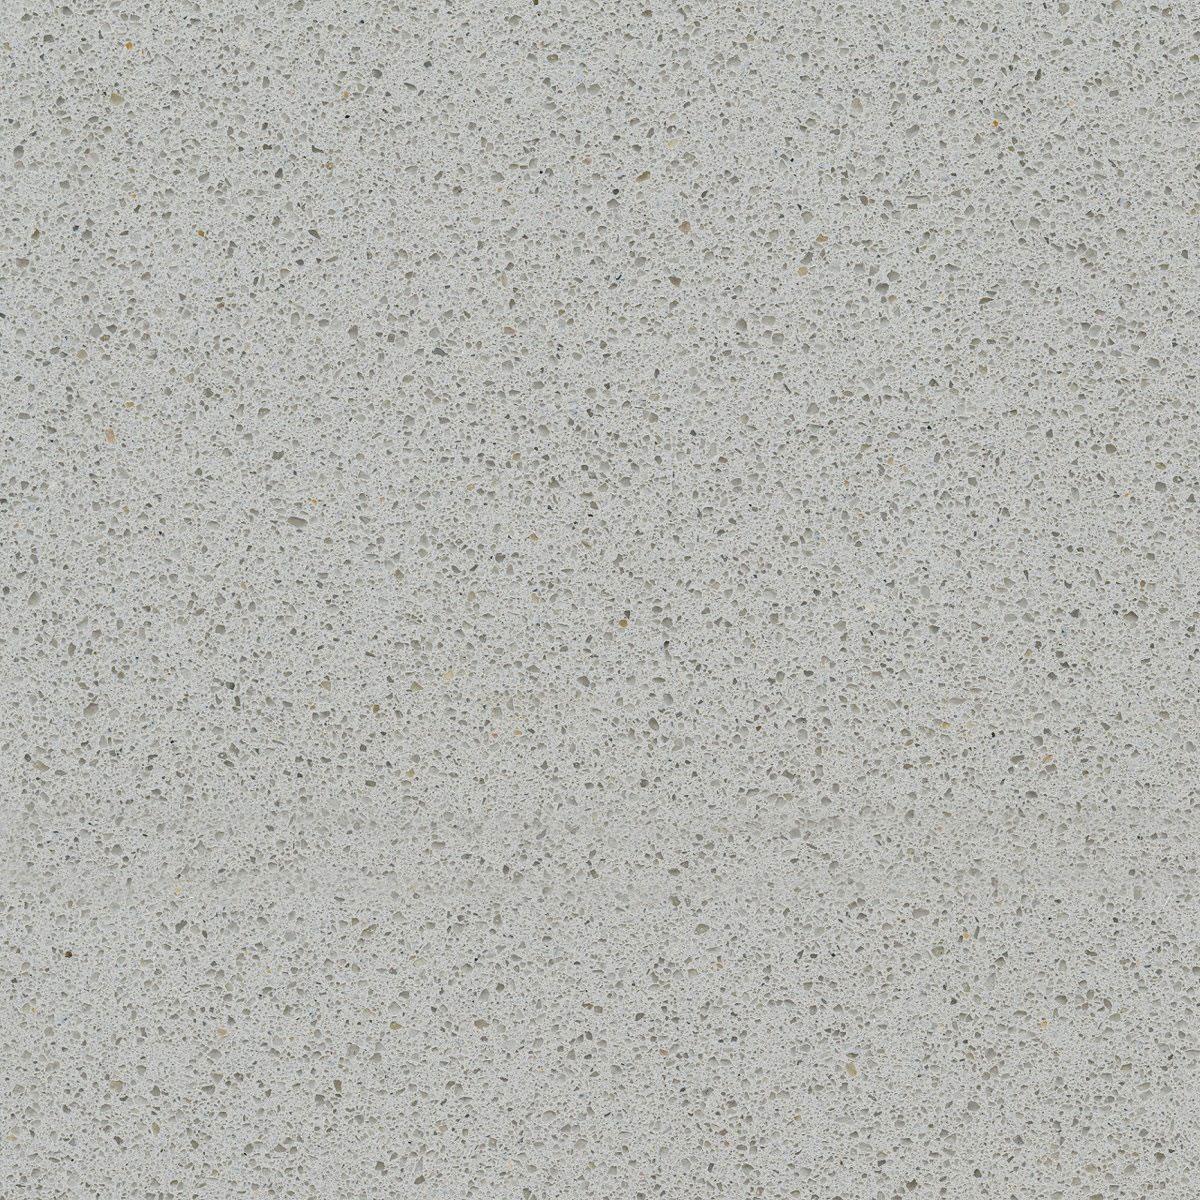 silestone-gris-niebla-ABASTEL